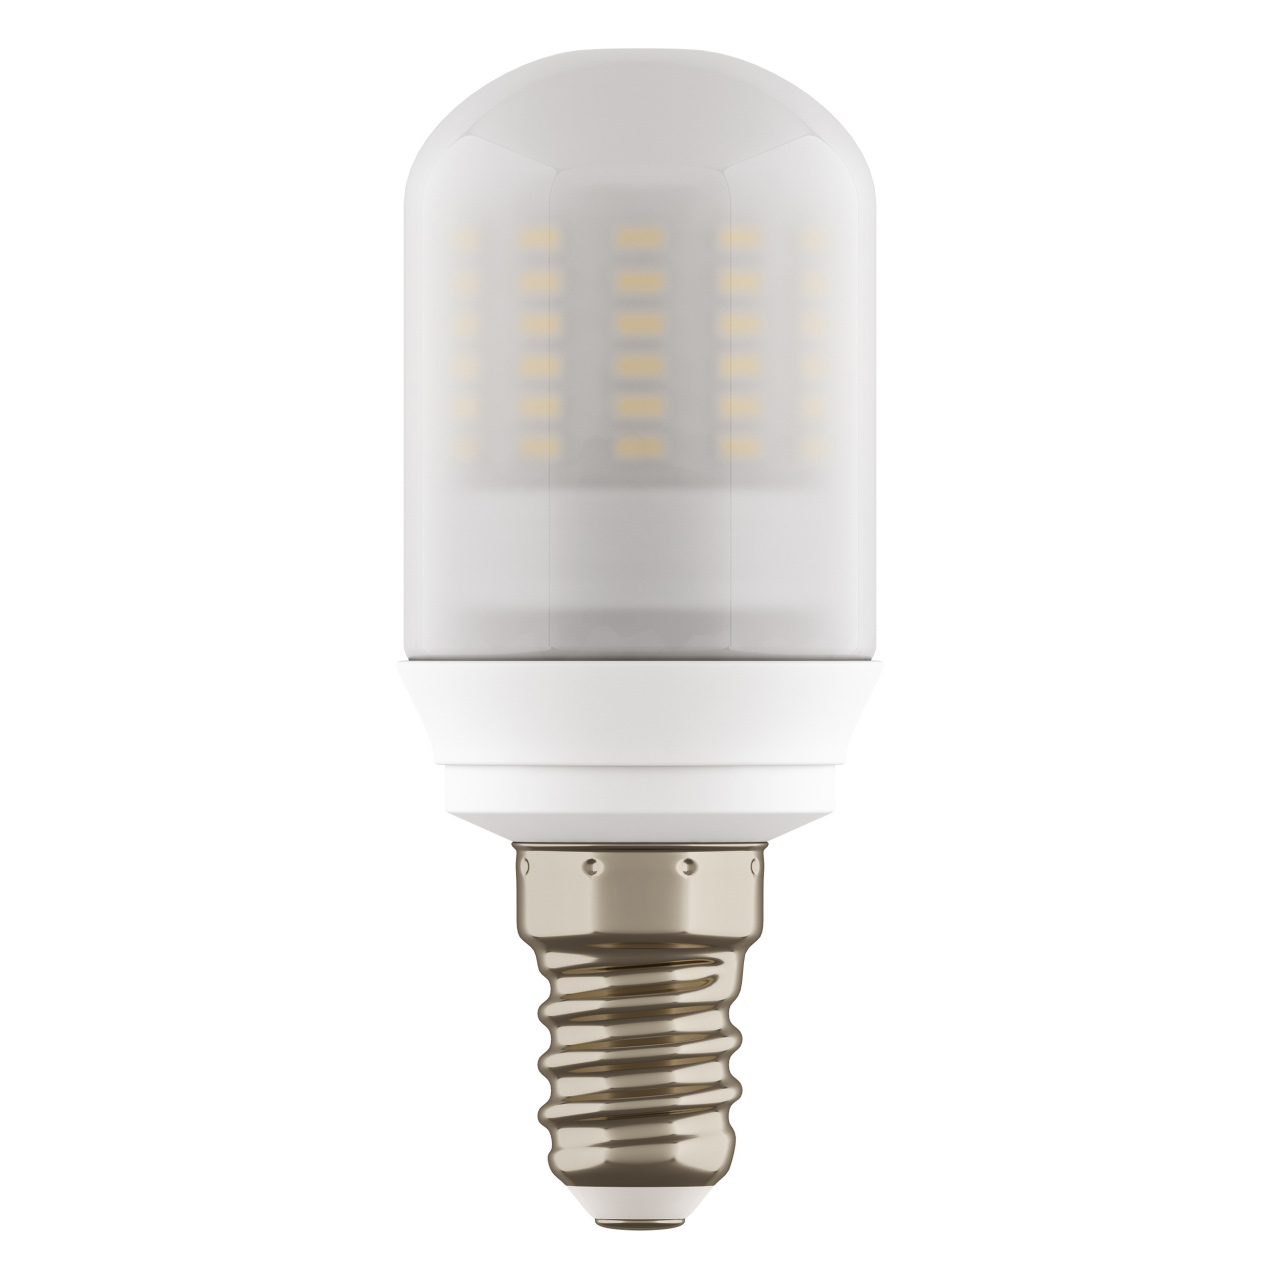 Лампа LED 220V T35 E14 9W=90W 770LM 360G FR 3000K 20000H Lightstar 930712